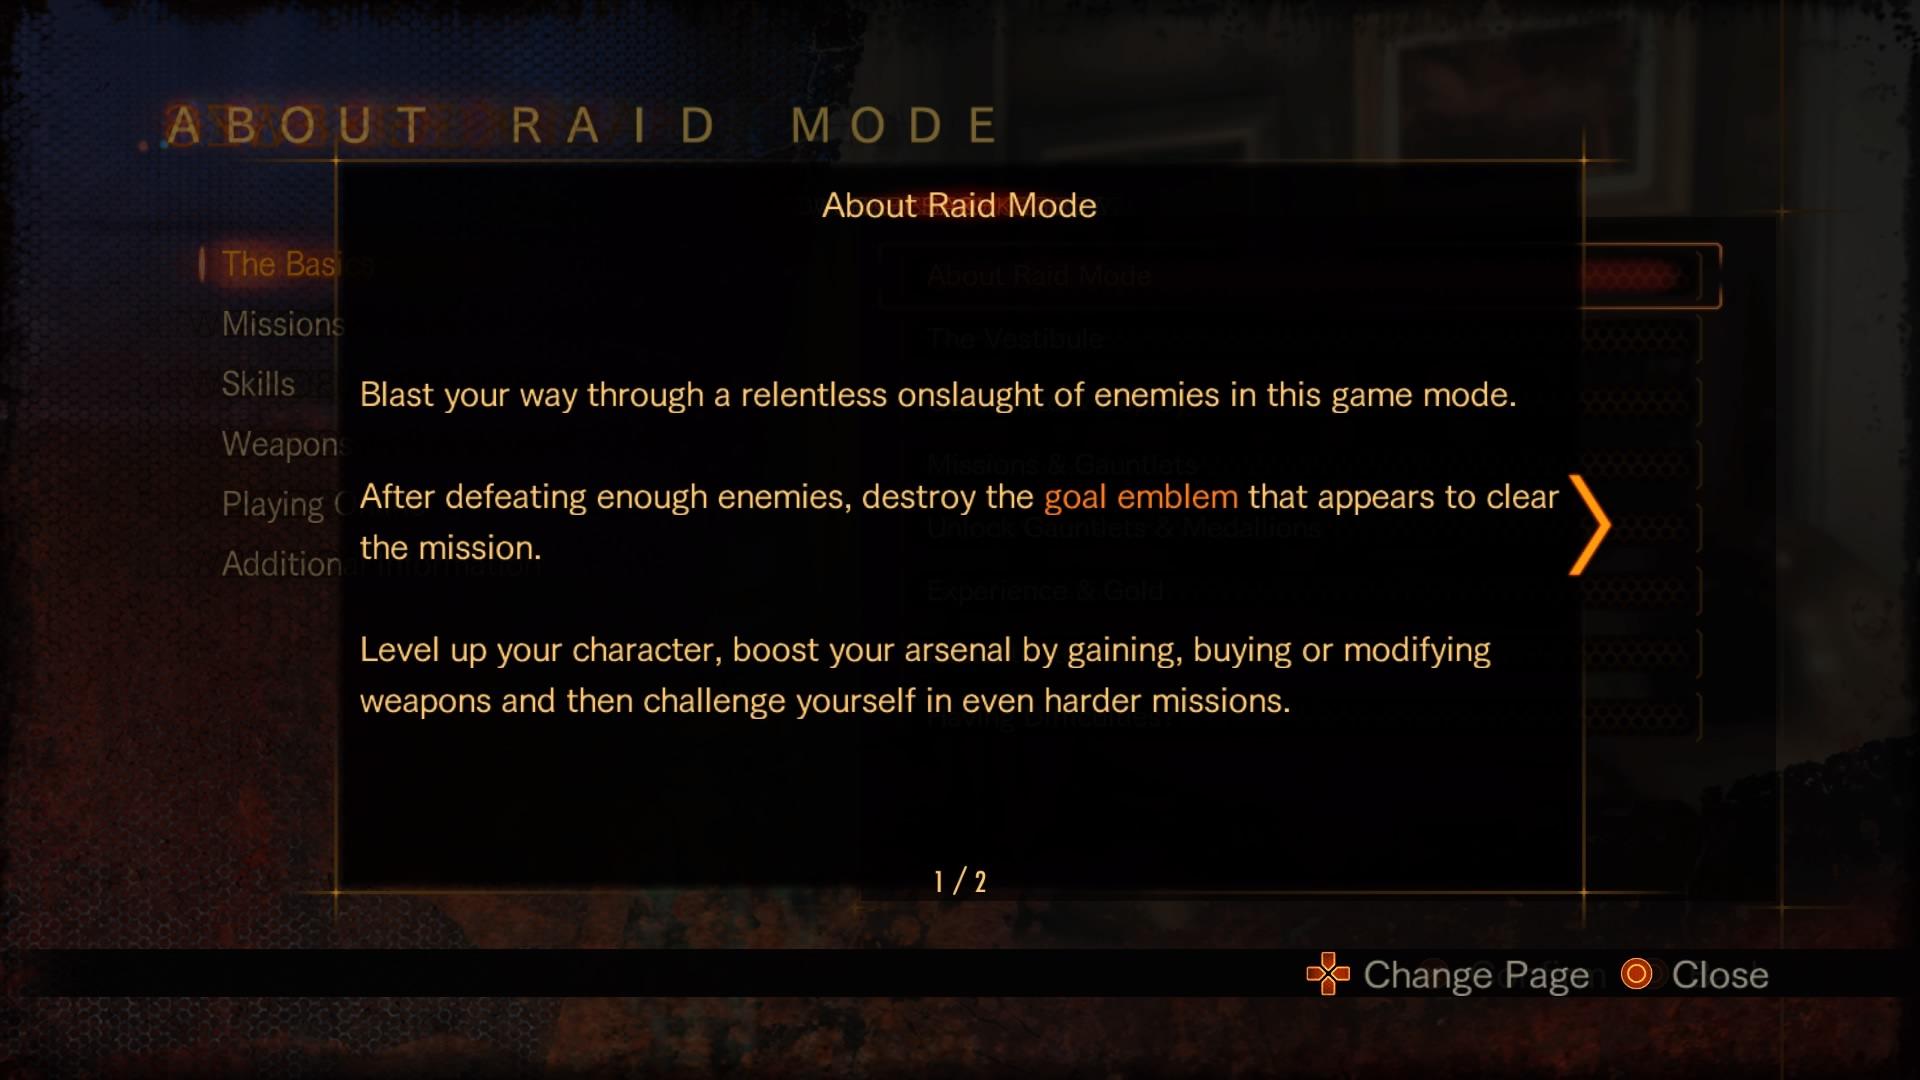 About Raid Mode